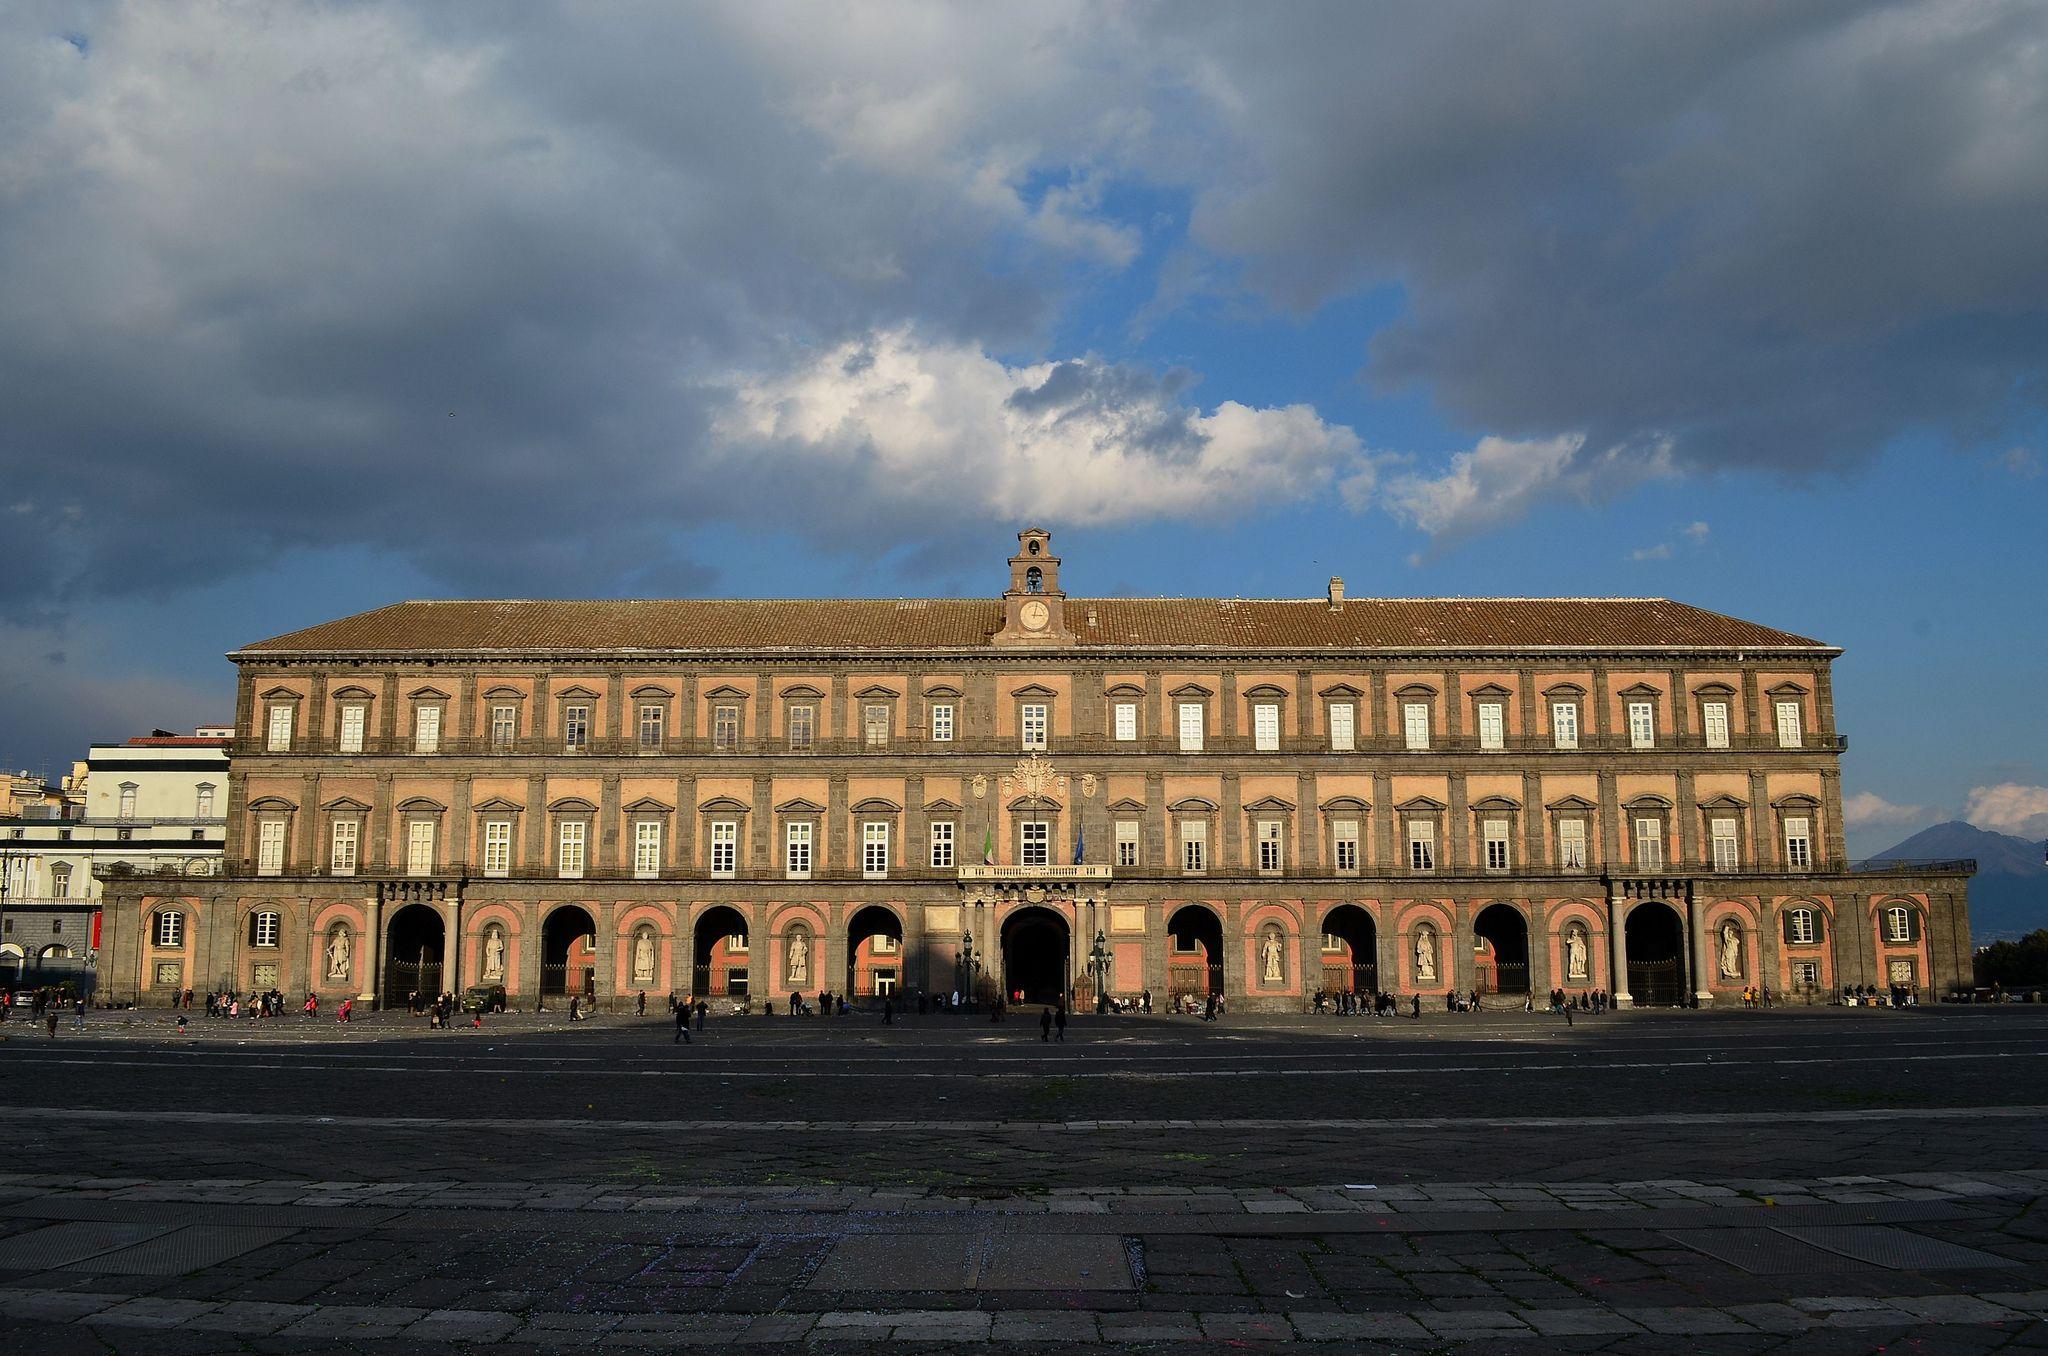 royal palace of naples, naples, 1620, probablydomenico fontana